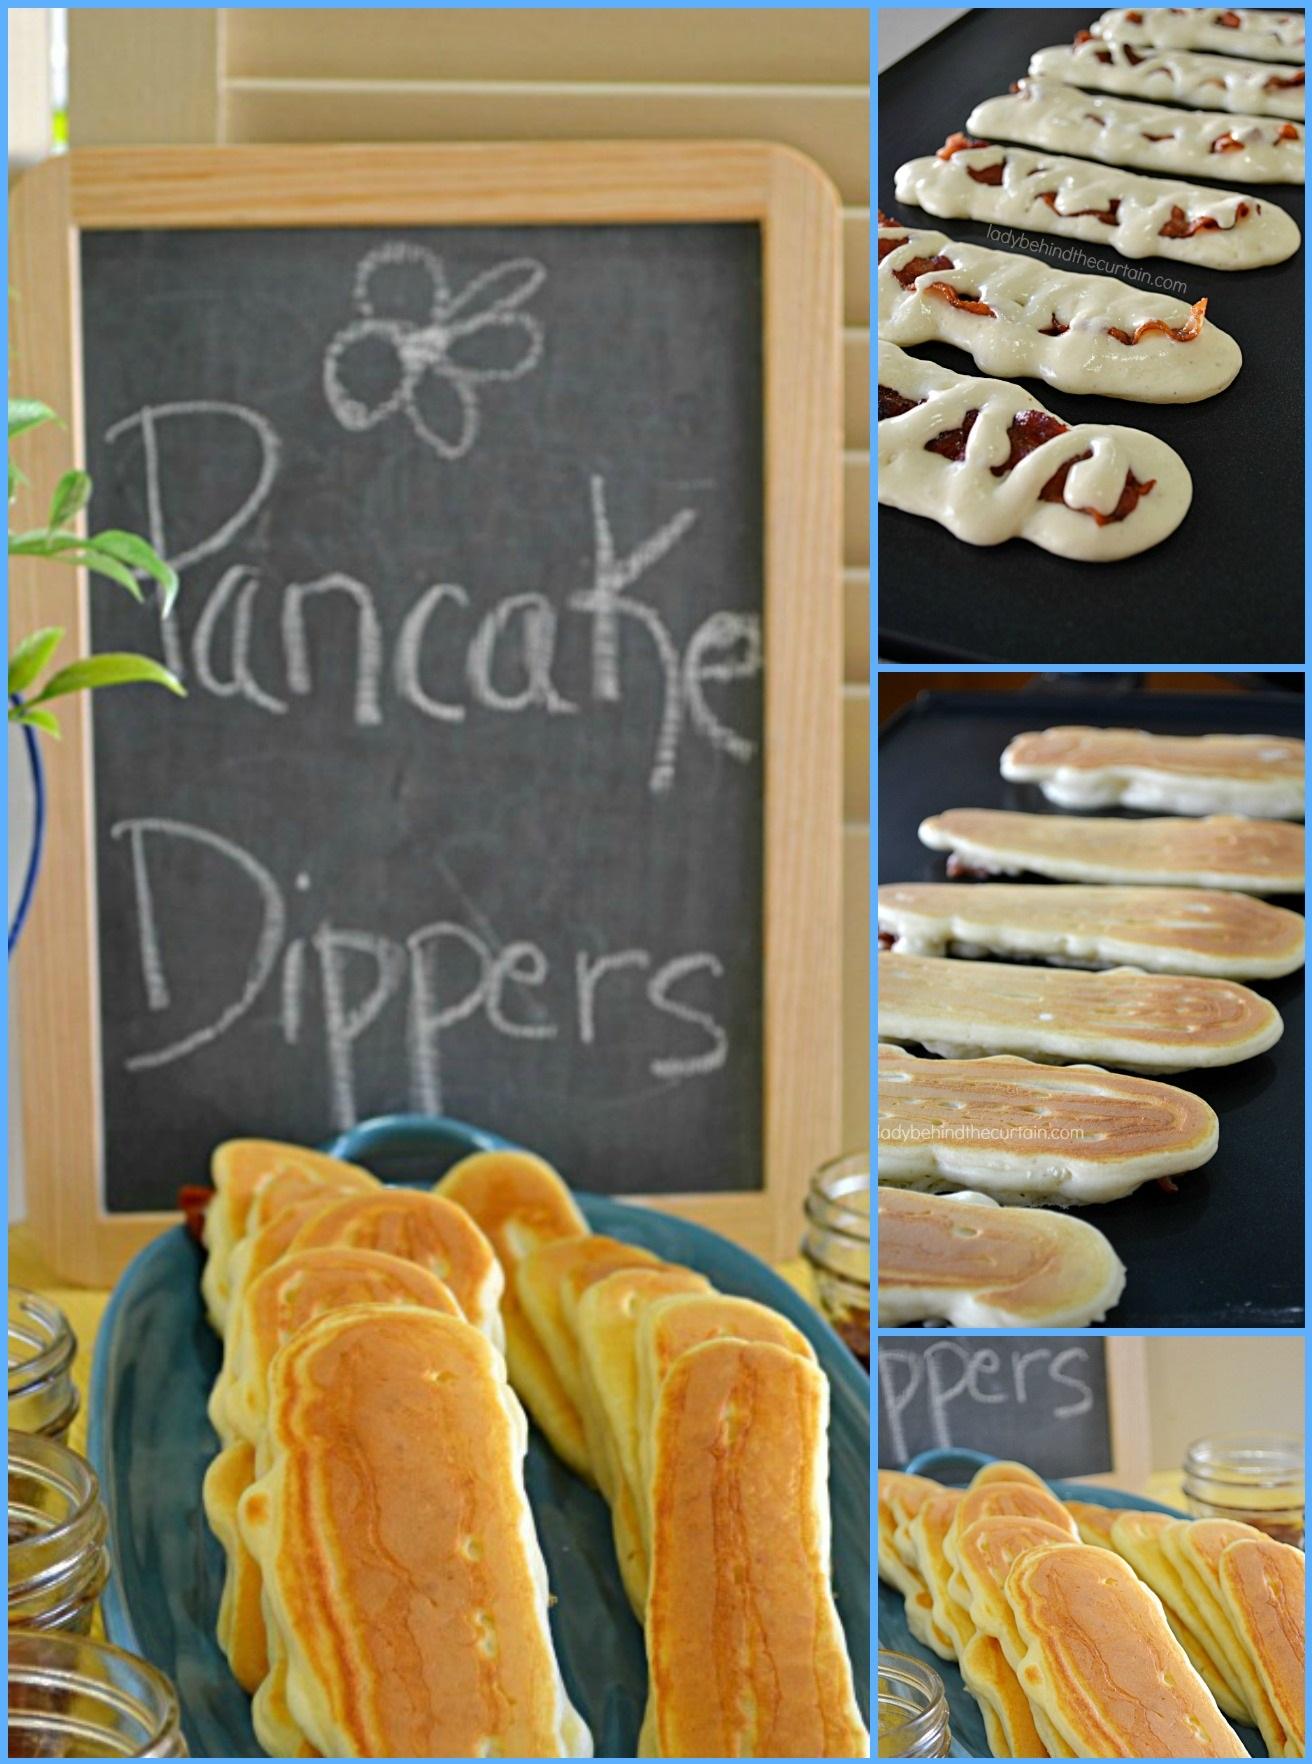 pancake-dippers.jpg